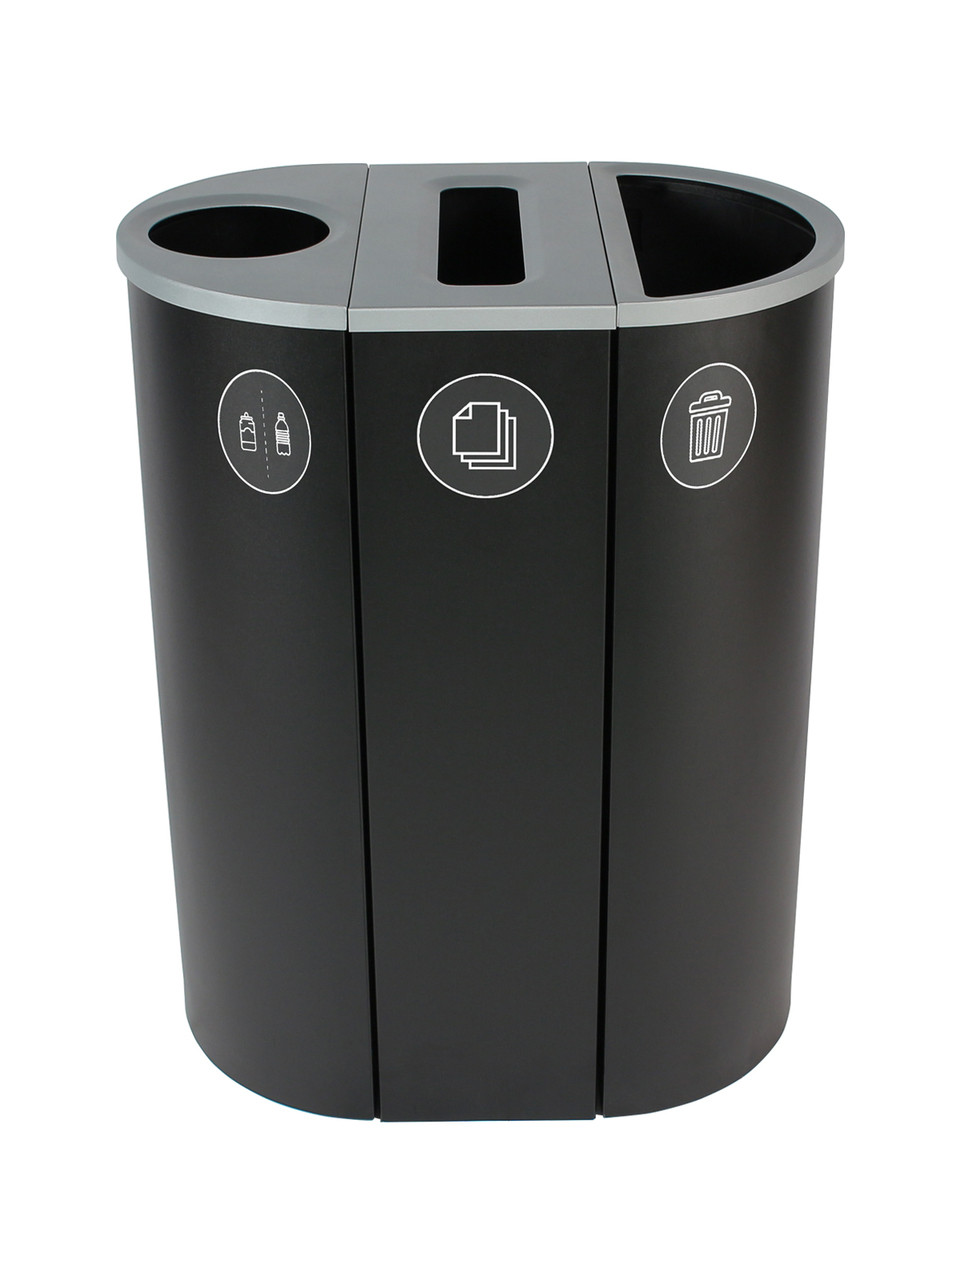 26 Gallon Spectrum Triple Recycling Station Black 8107113-134